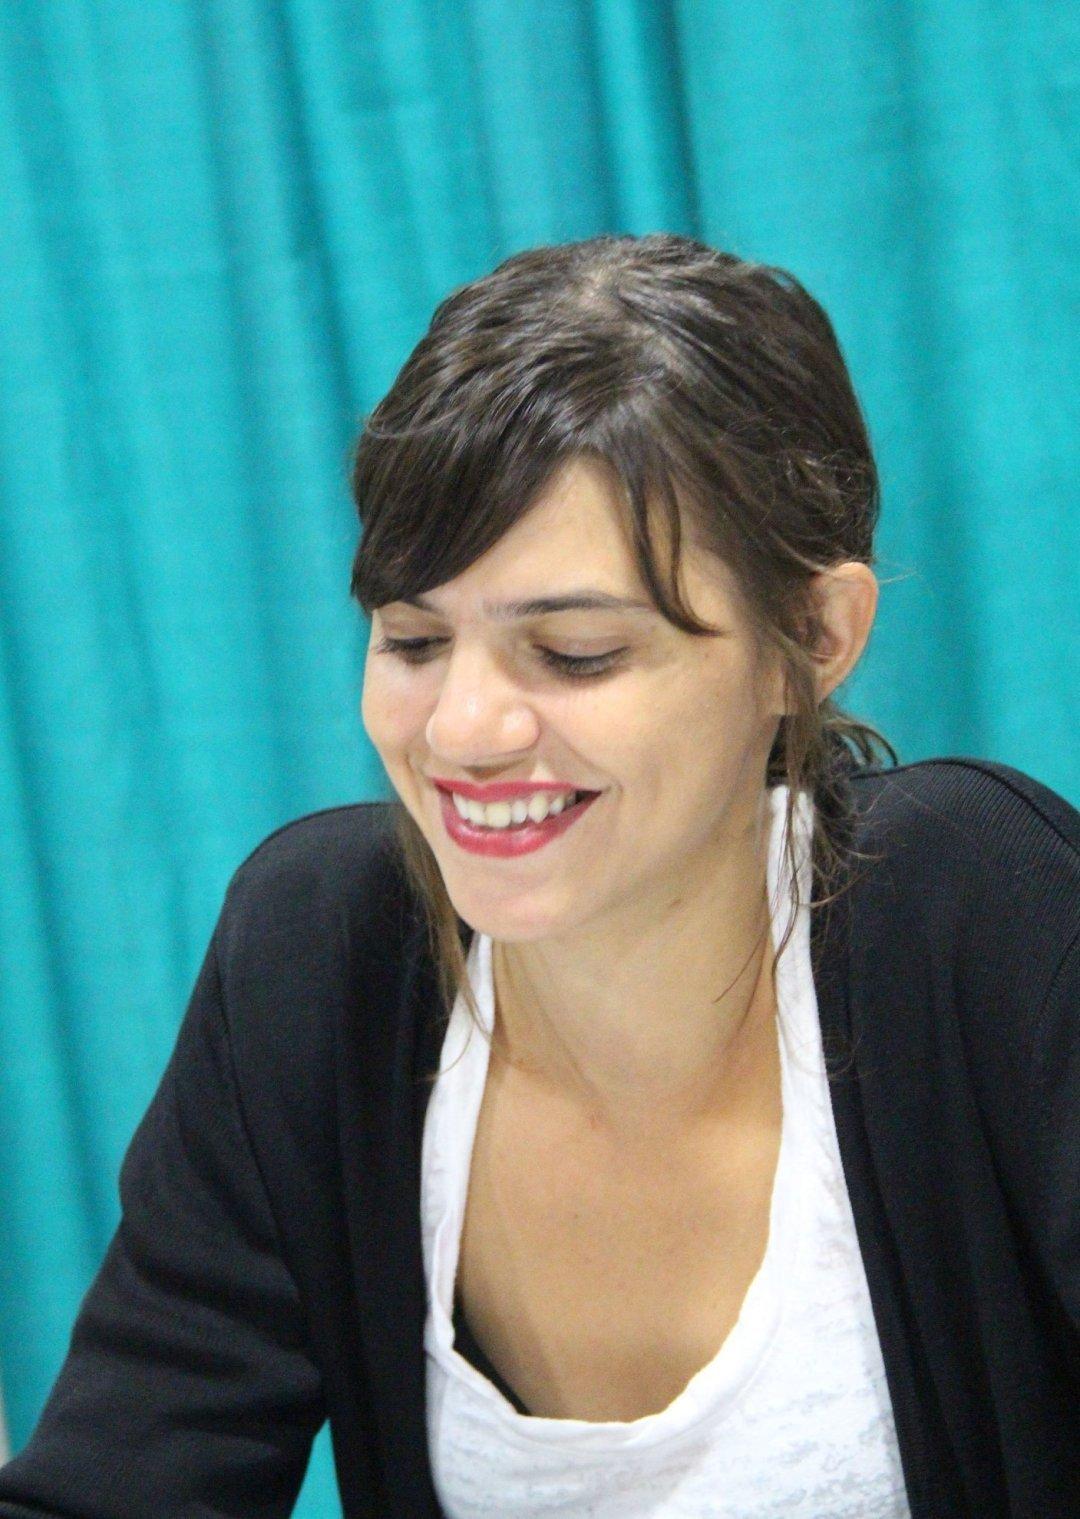 Valeria Luiselli | © Fourandsixty/WikiCommons